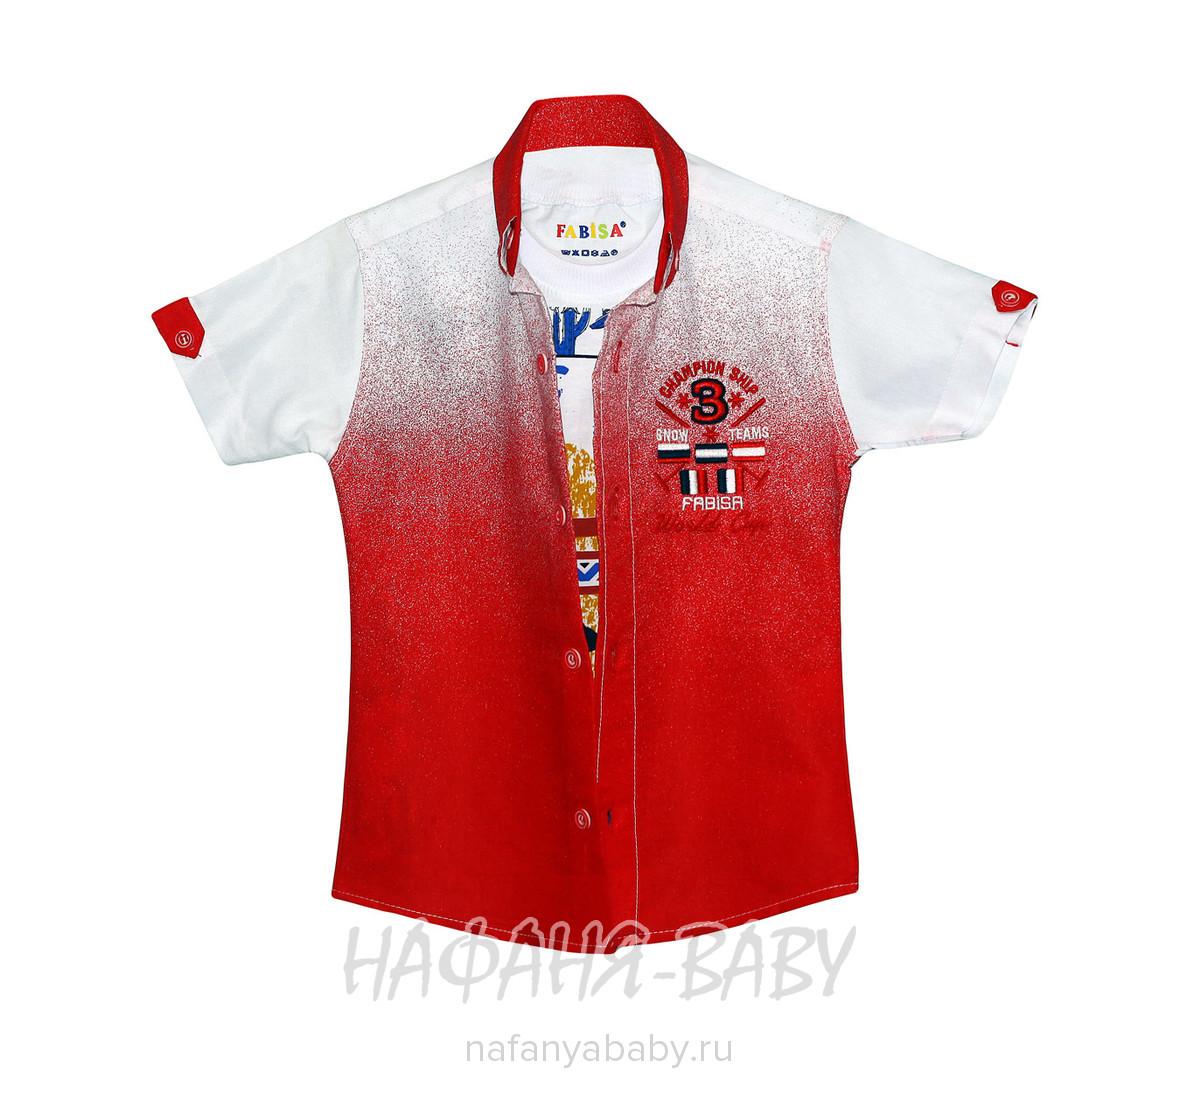 Детский комплект рубашка+майка FABISA арт: 118 5-8, 5-9 лет, оптом Турция